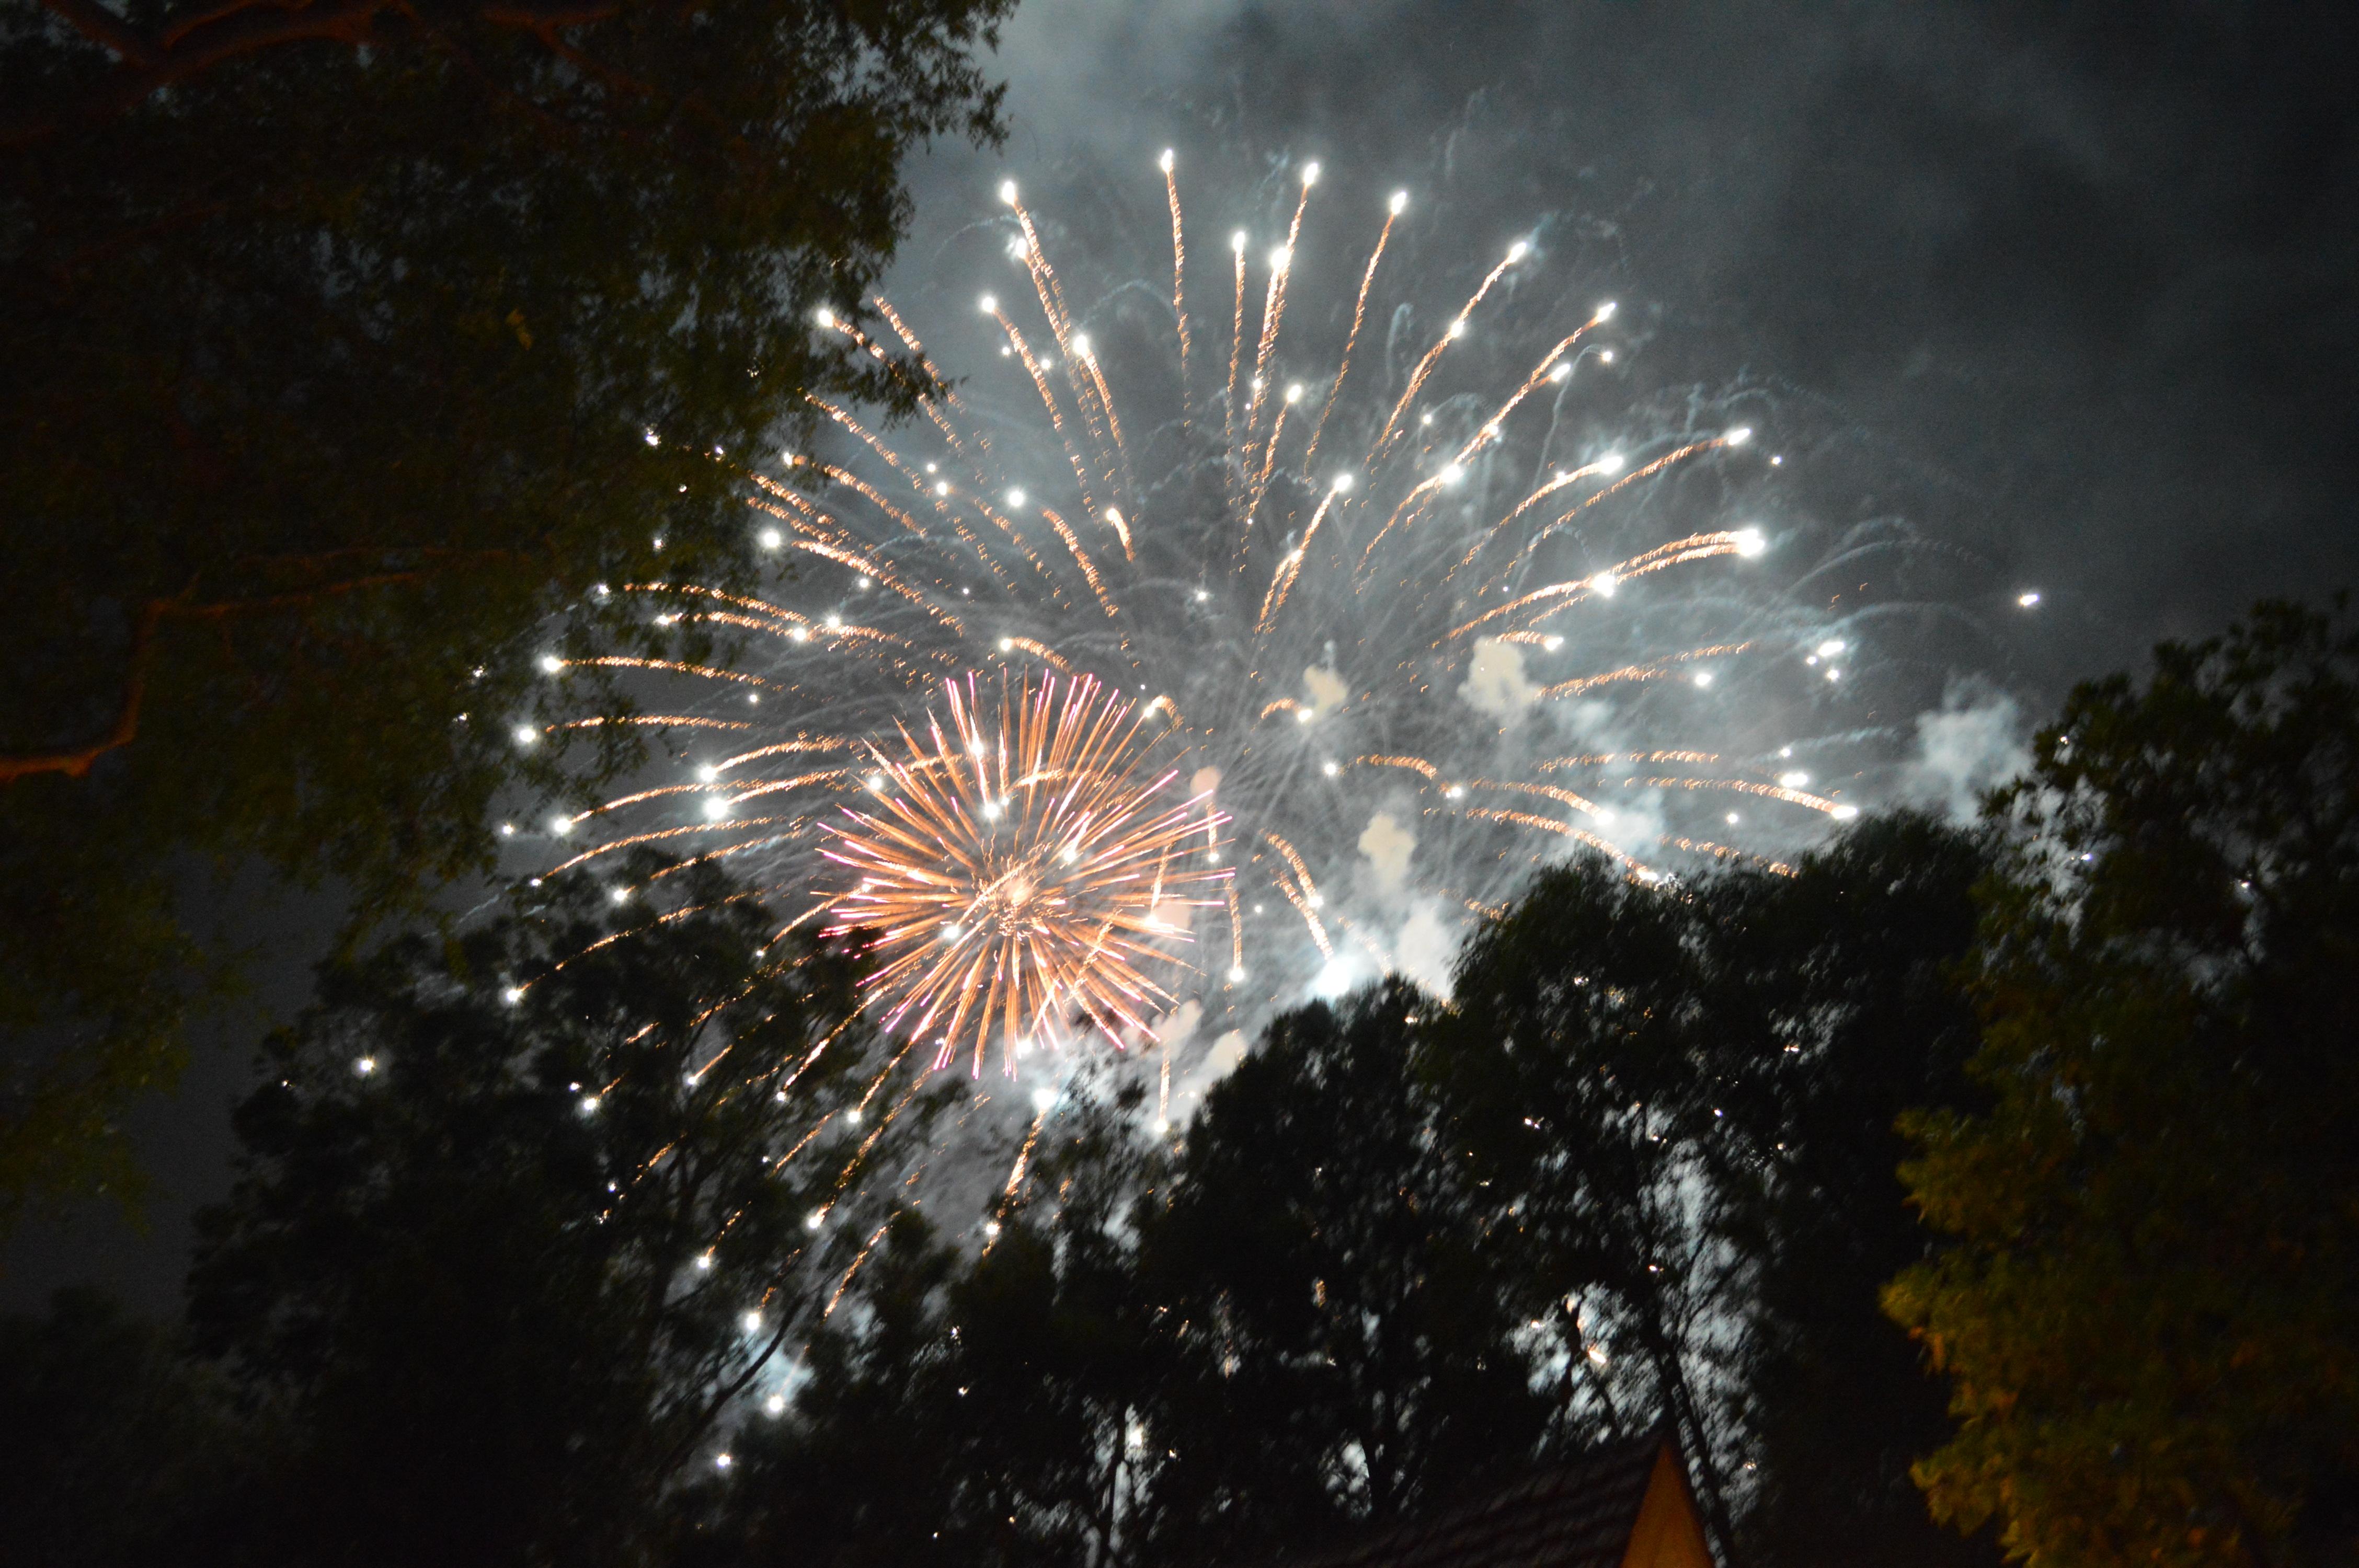 Disneyland vs California Adventure theme park. These are nightly fireworks